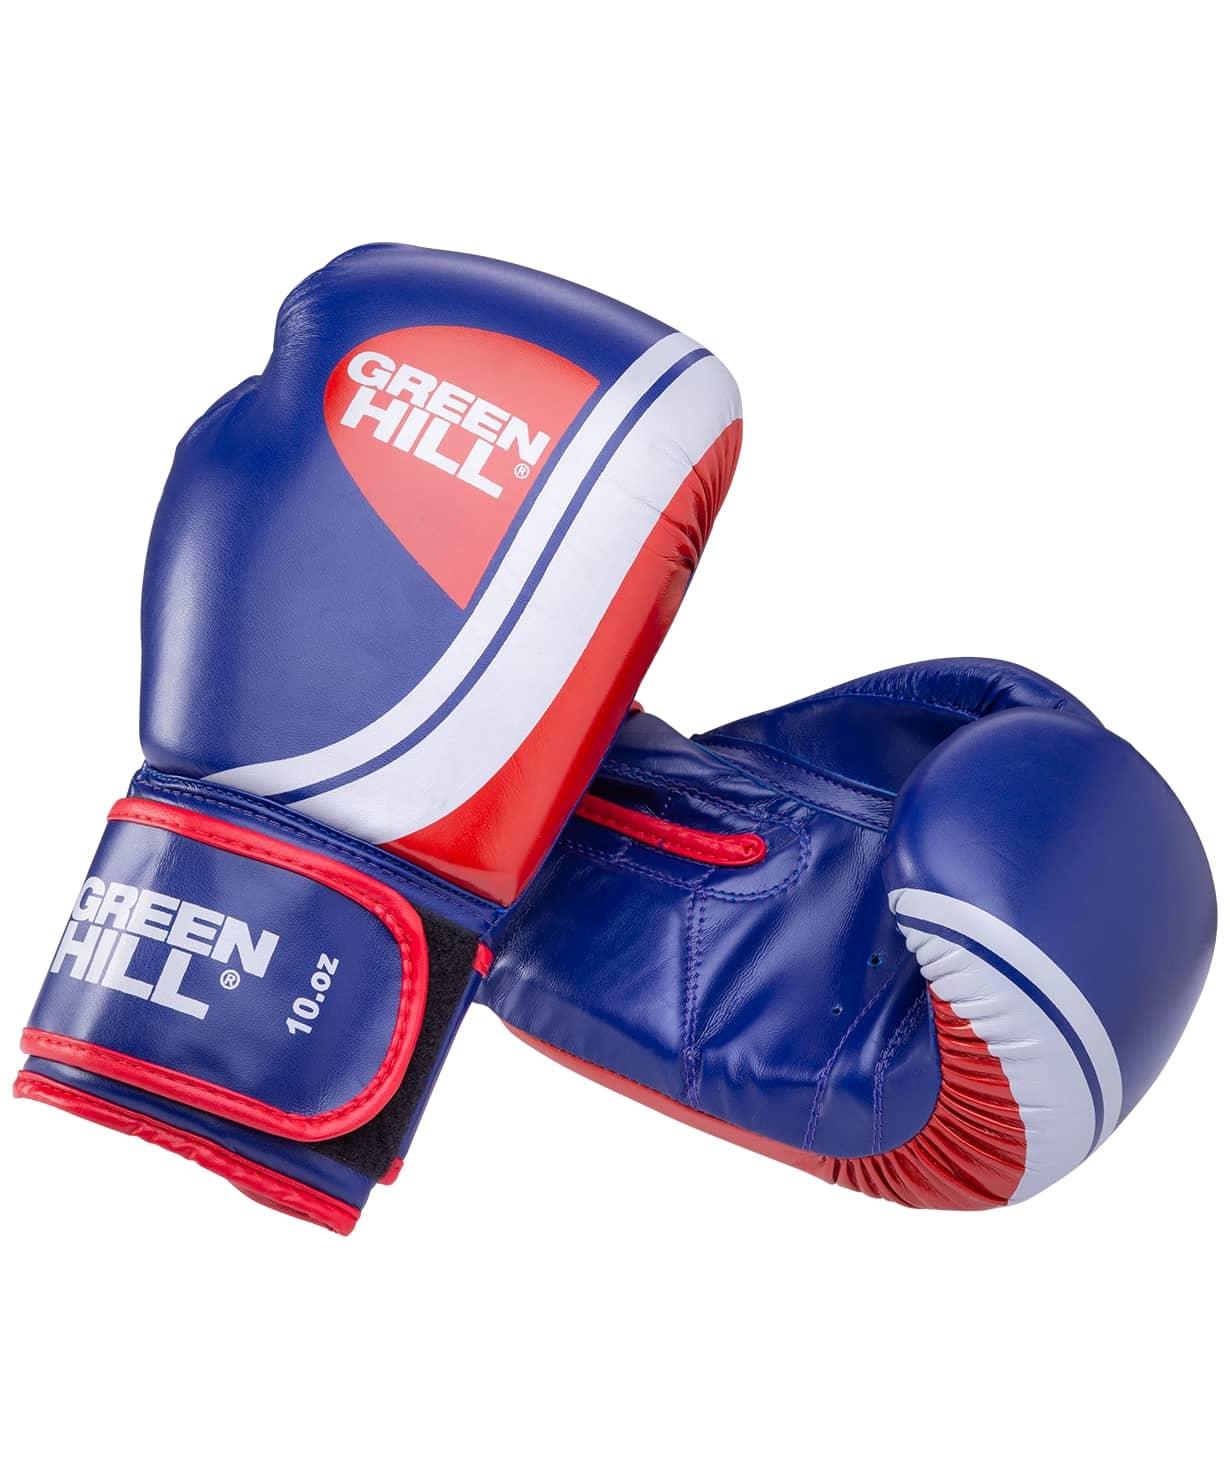 Перчатки боксерские Knockout BGK-2266, 8oz, к/з, синий